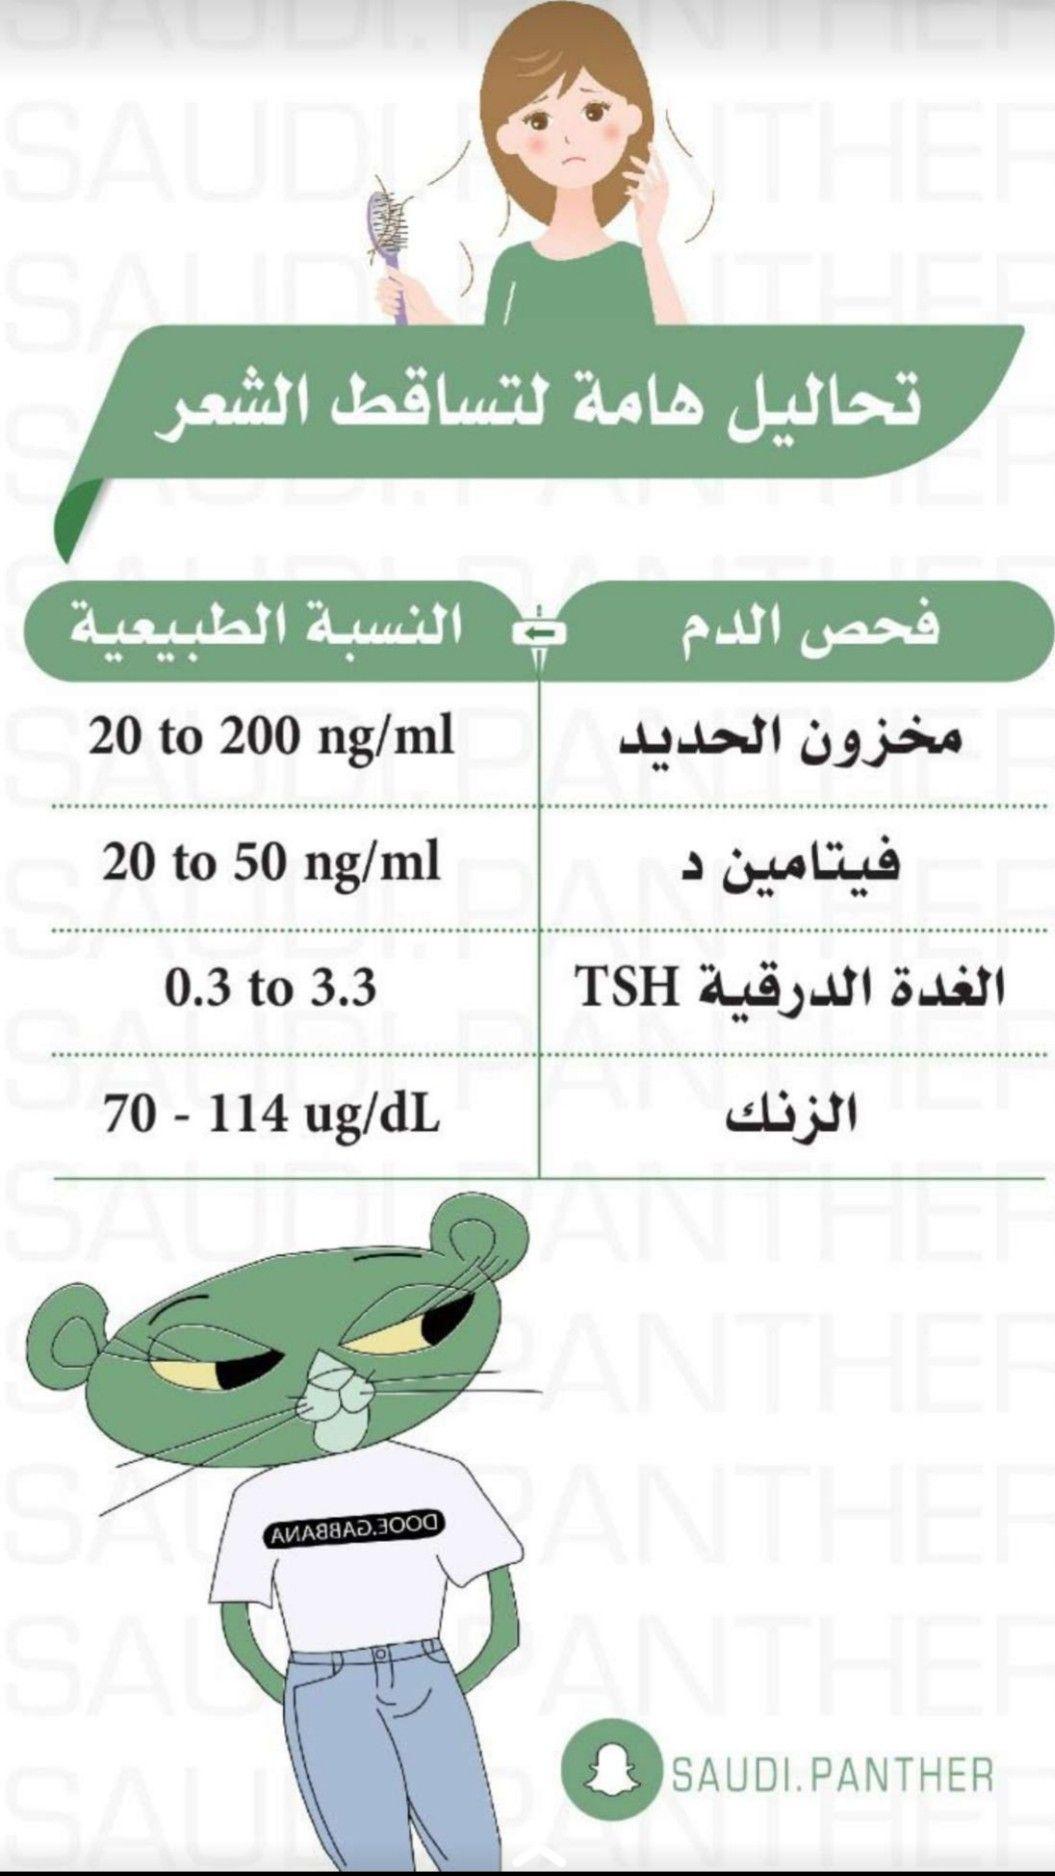 Pin By Abdulrahman Alghamdi On البانثر السعودي Health Facts Fitness Health Skin Care Body Skin Care